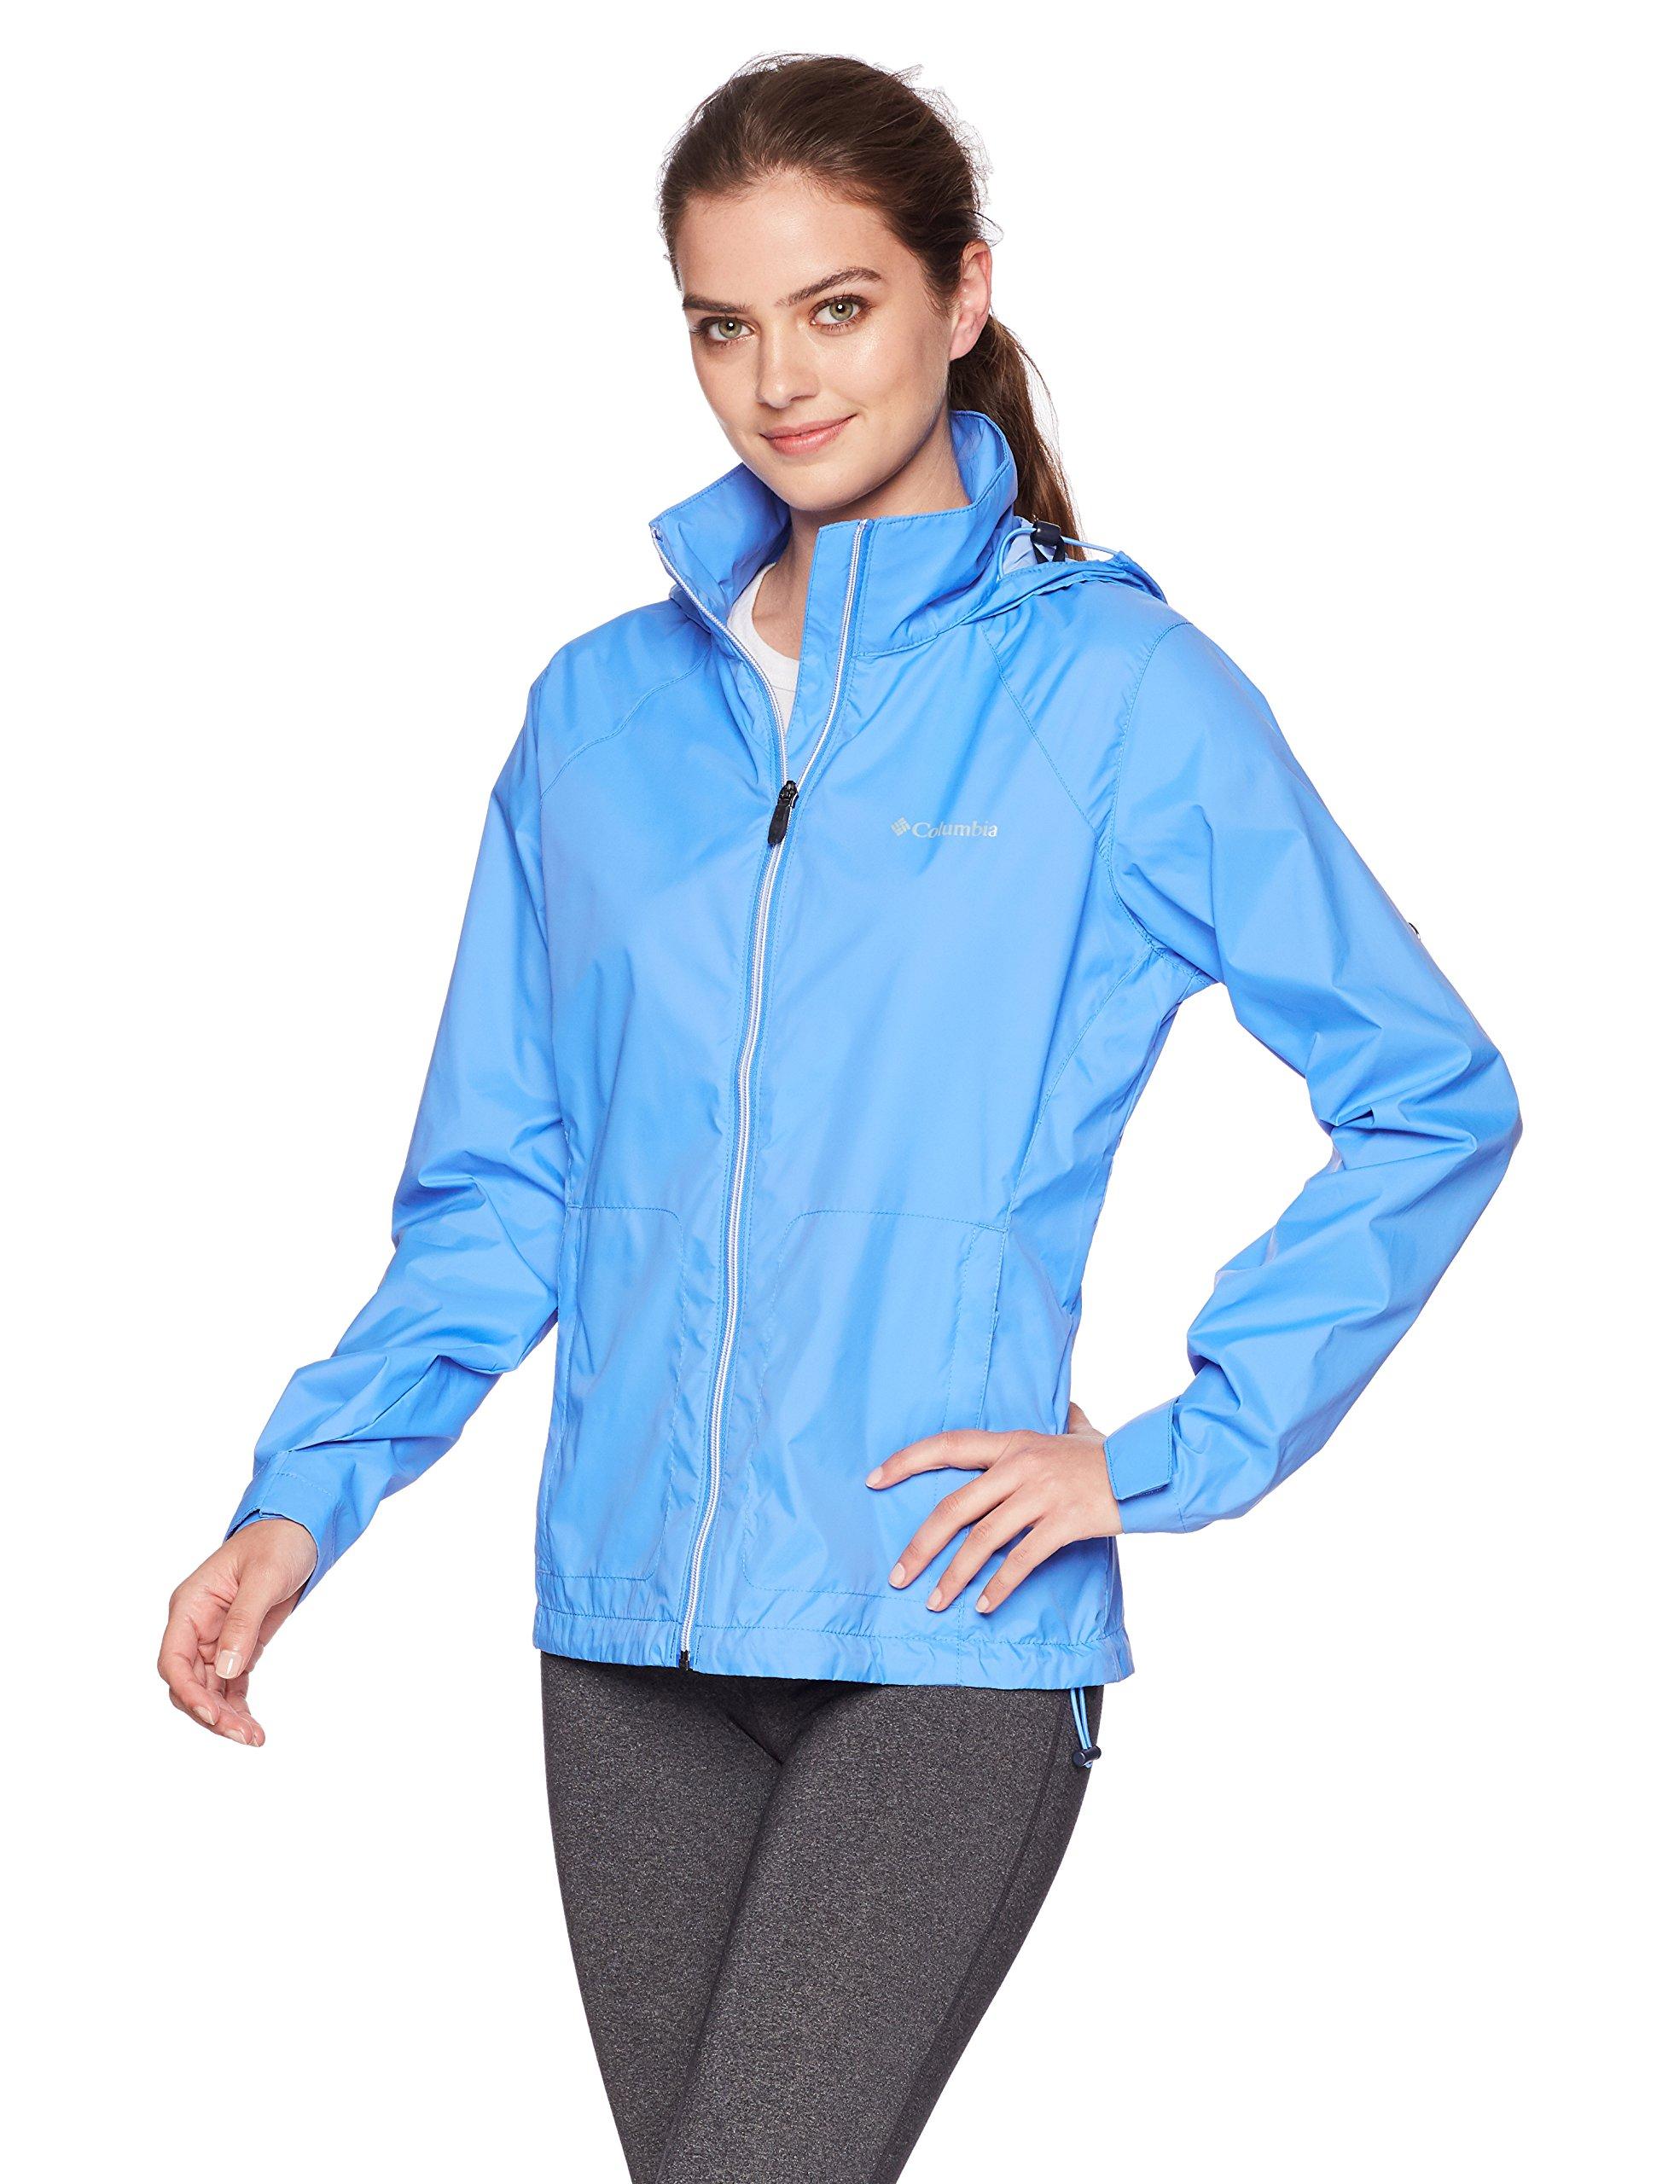 Columbia Women's Switchback III Adjustable Waterproof Rain Jacket, Harbor Blue, X-Small